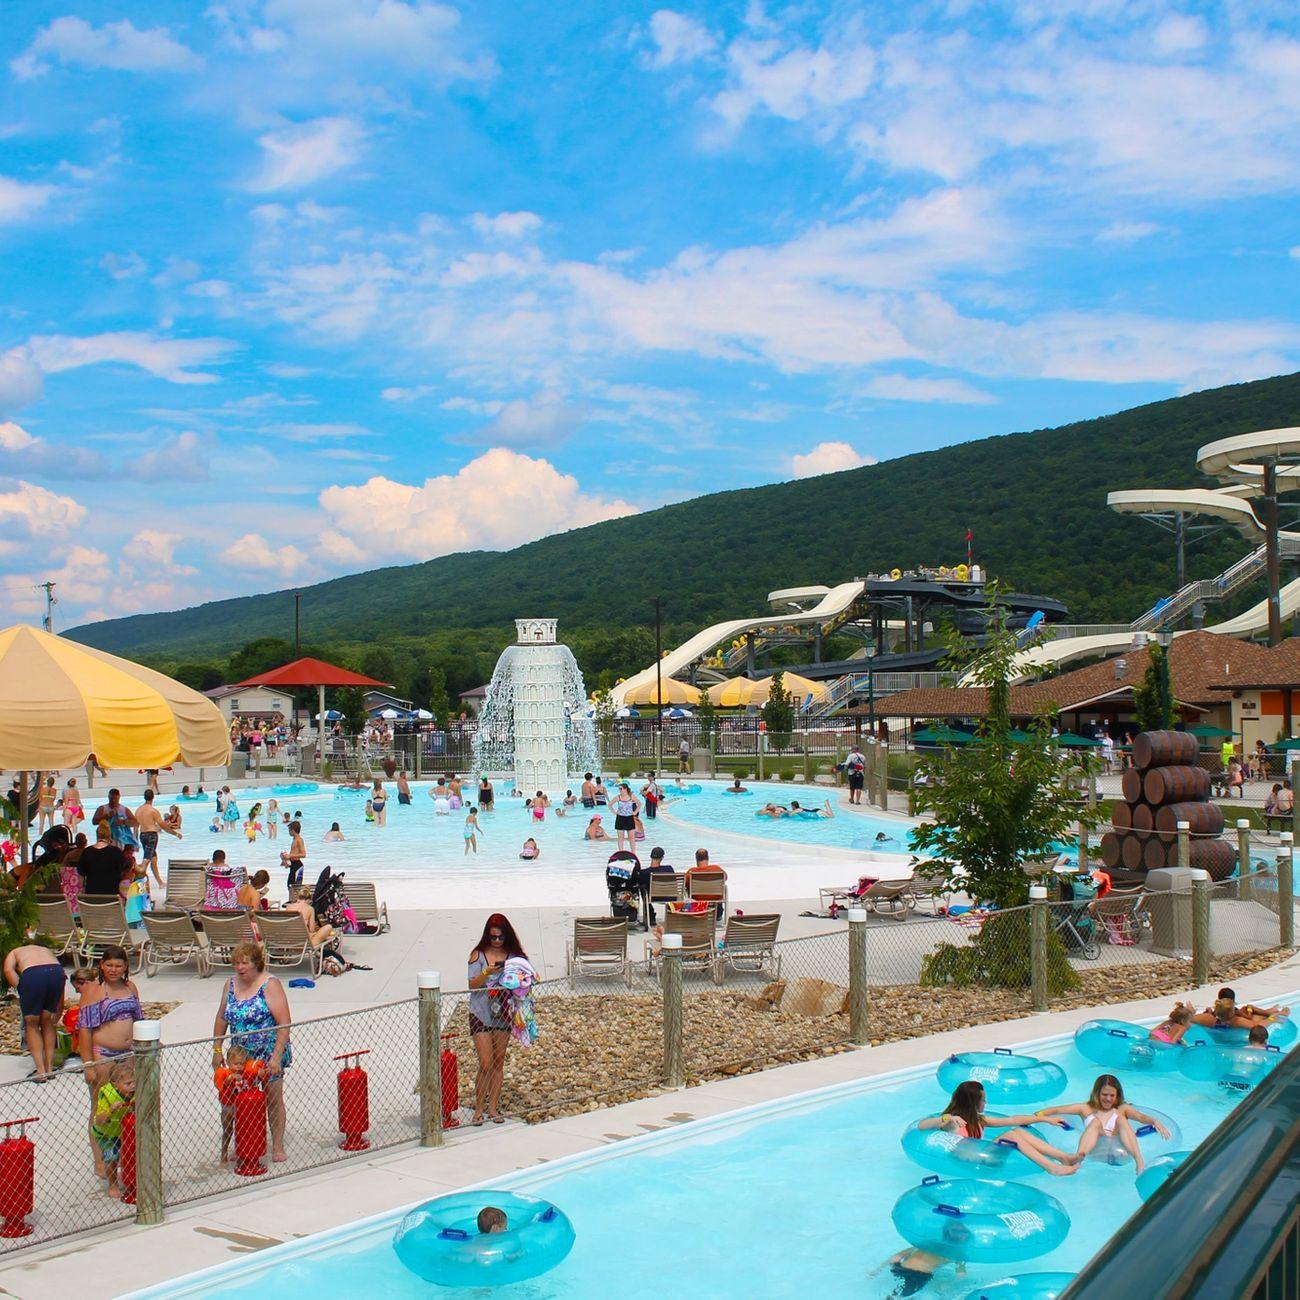 Image of people enjoying a sunny day at the Laguna Splash Water Park